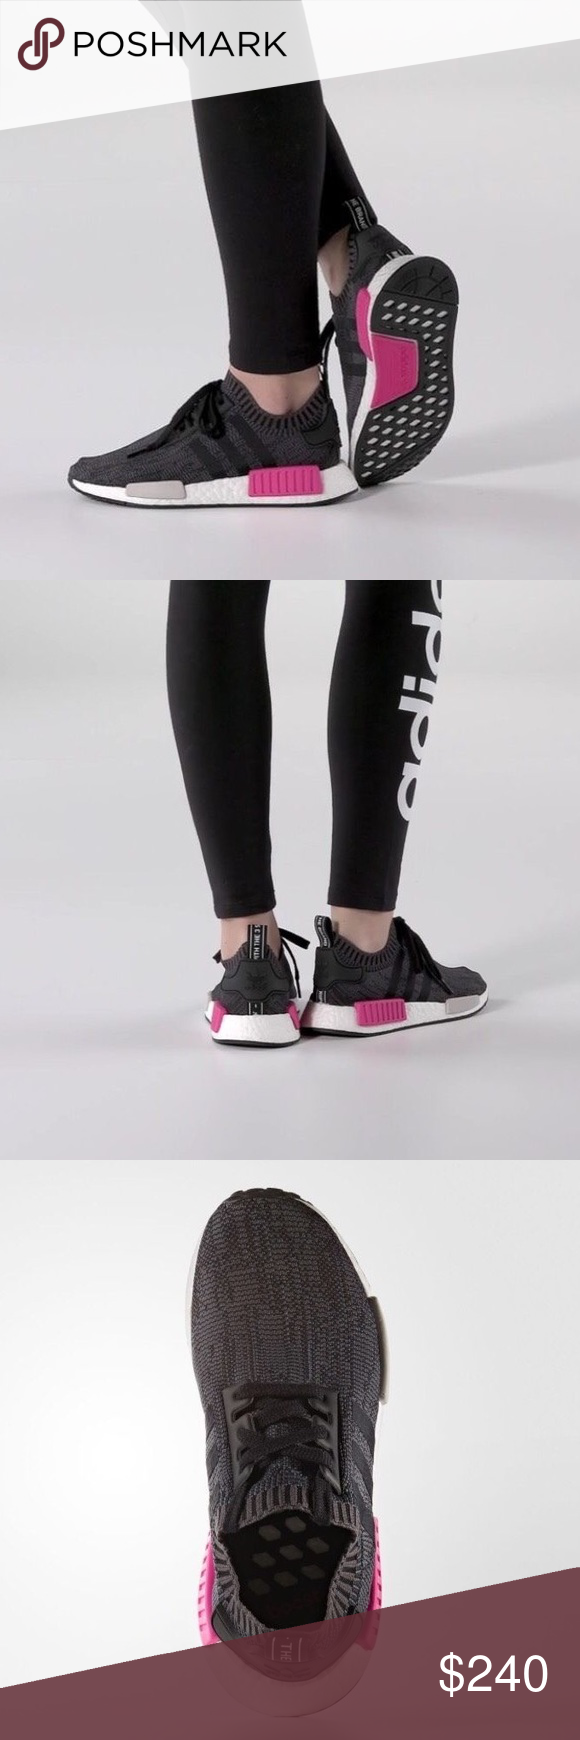 adidas nmd r1 pk japan black adidas yeezy women size 8